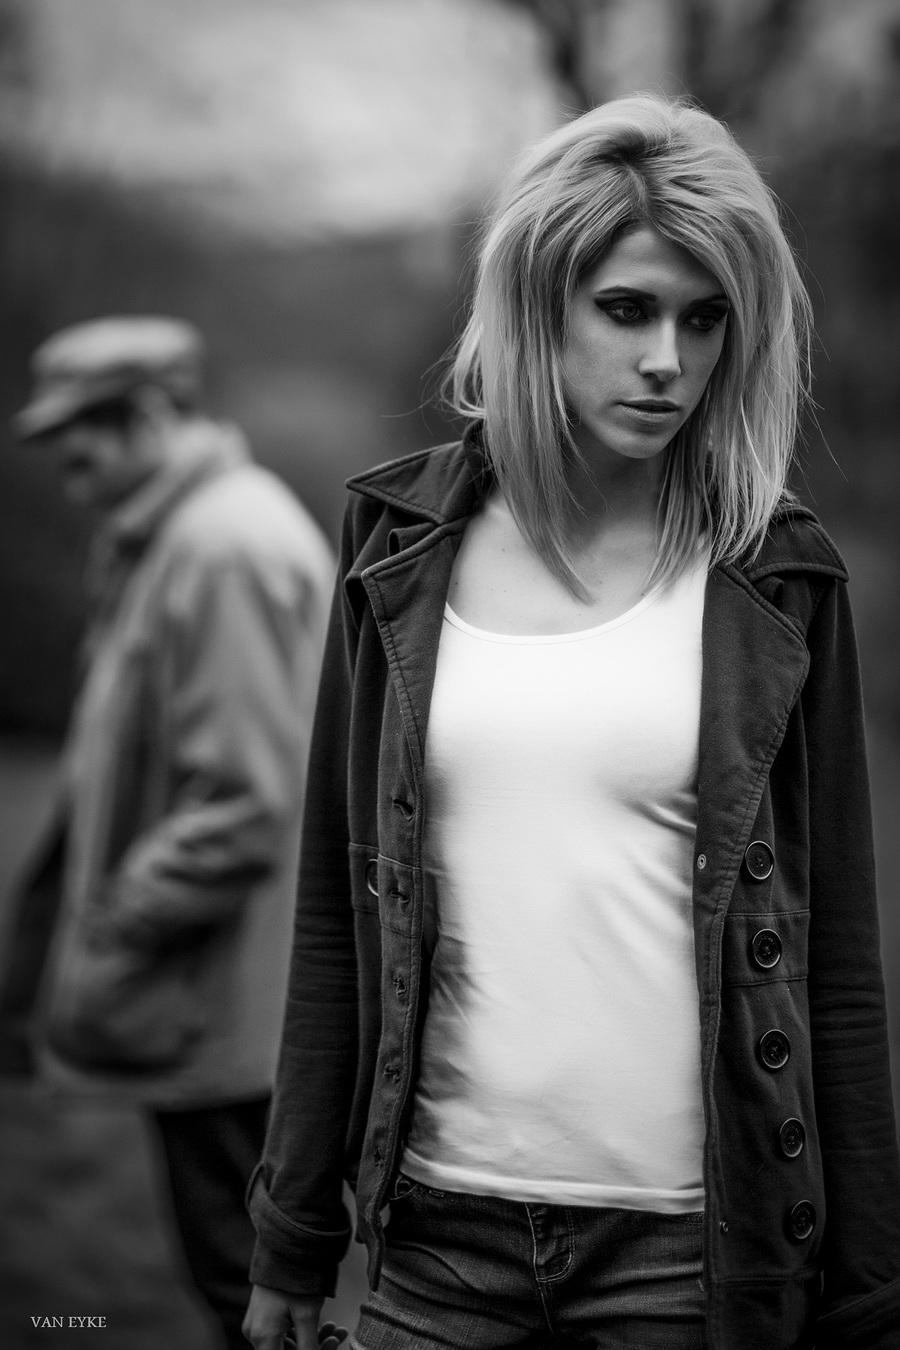 It's over... / Photography by VanEyke, Model Izabela / Uploaded 4th November 2015 @ 12:29 PM